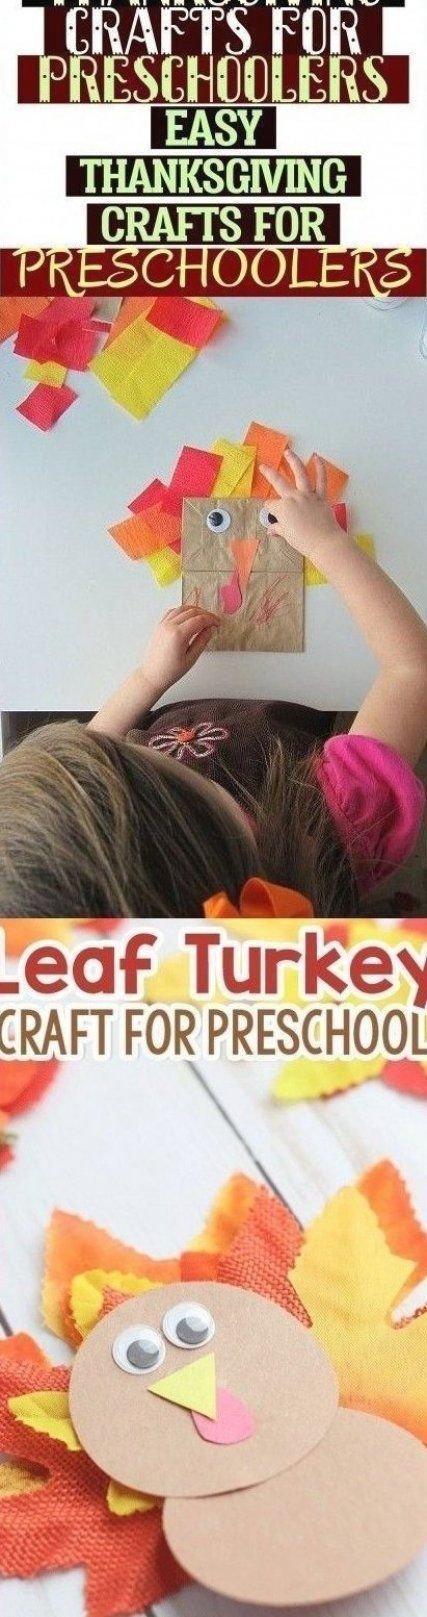 Baby showers thanksgiving crafts preschool thanksgiving crafts preschoo #baby #Crafts